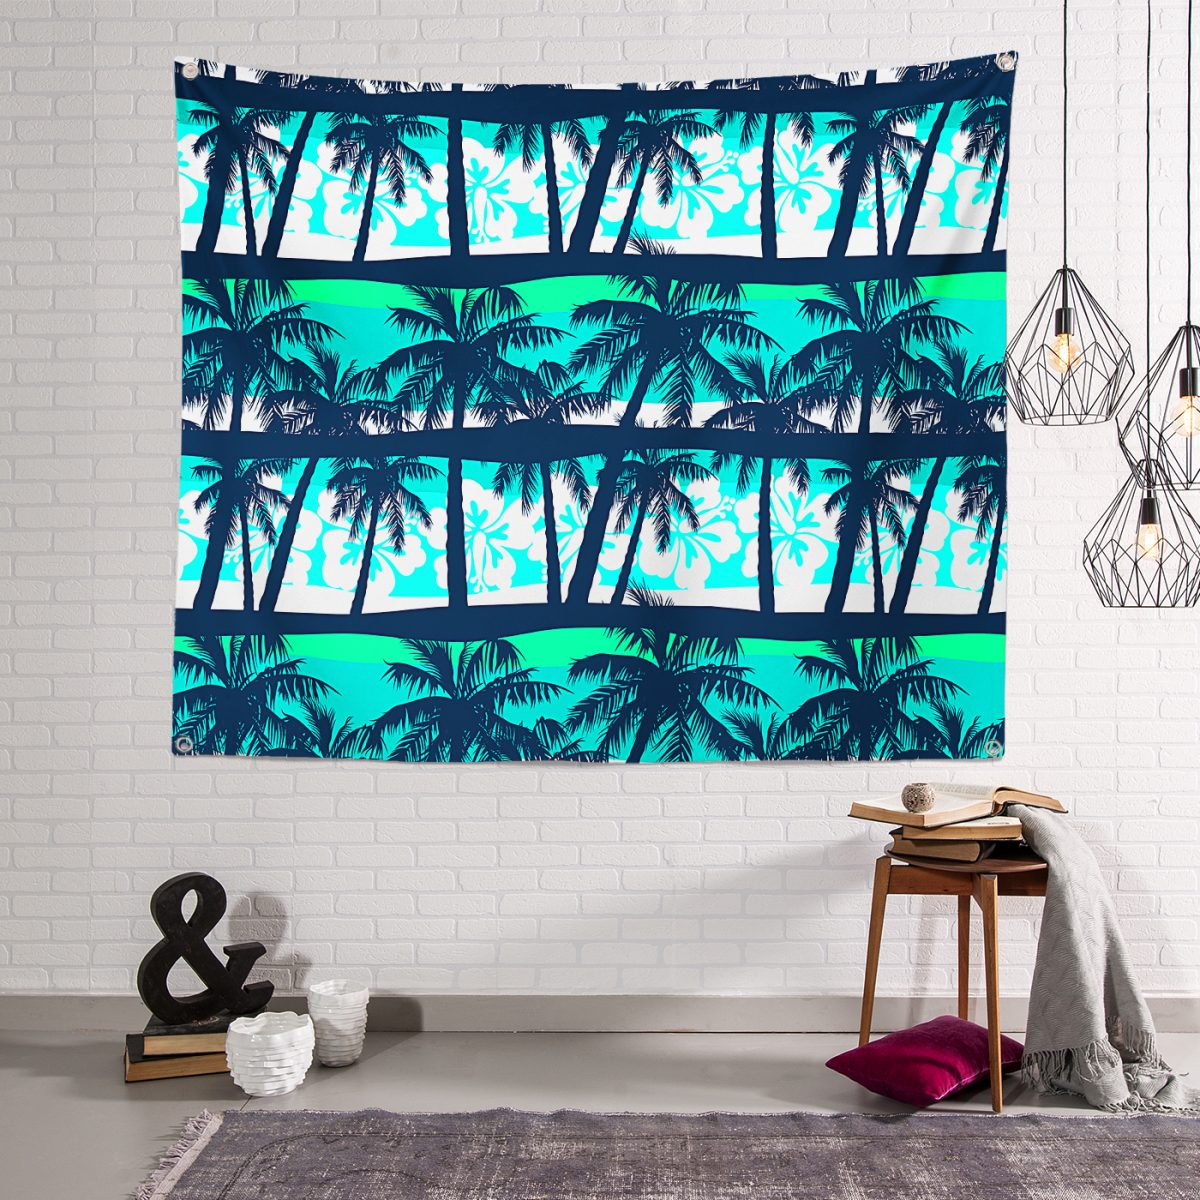 Palmiye Desenli Dijital baskılı Modern RealHomes Tapestry Duvar Örtüsü Realhomes